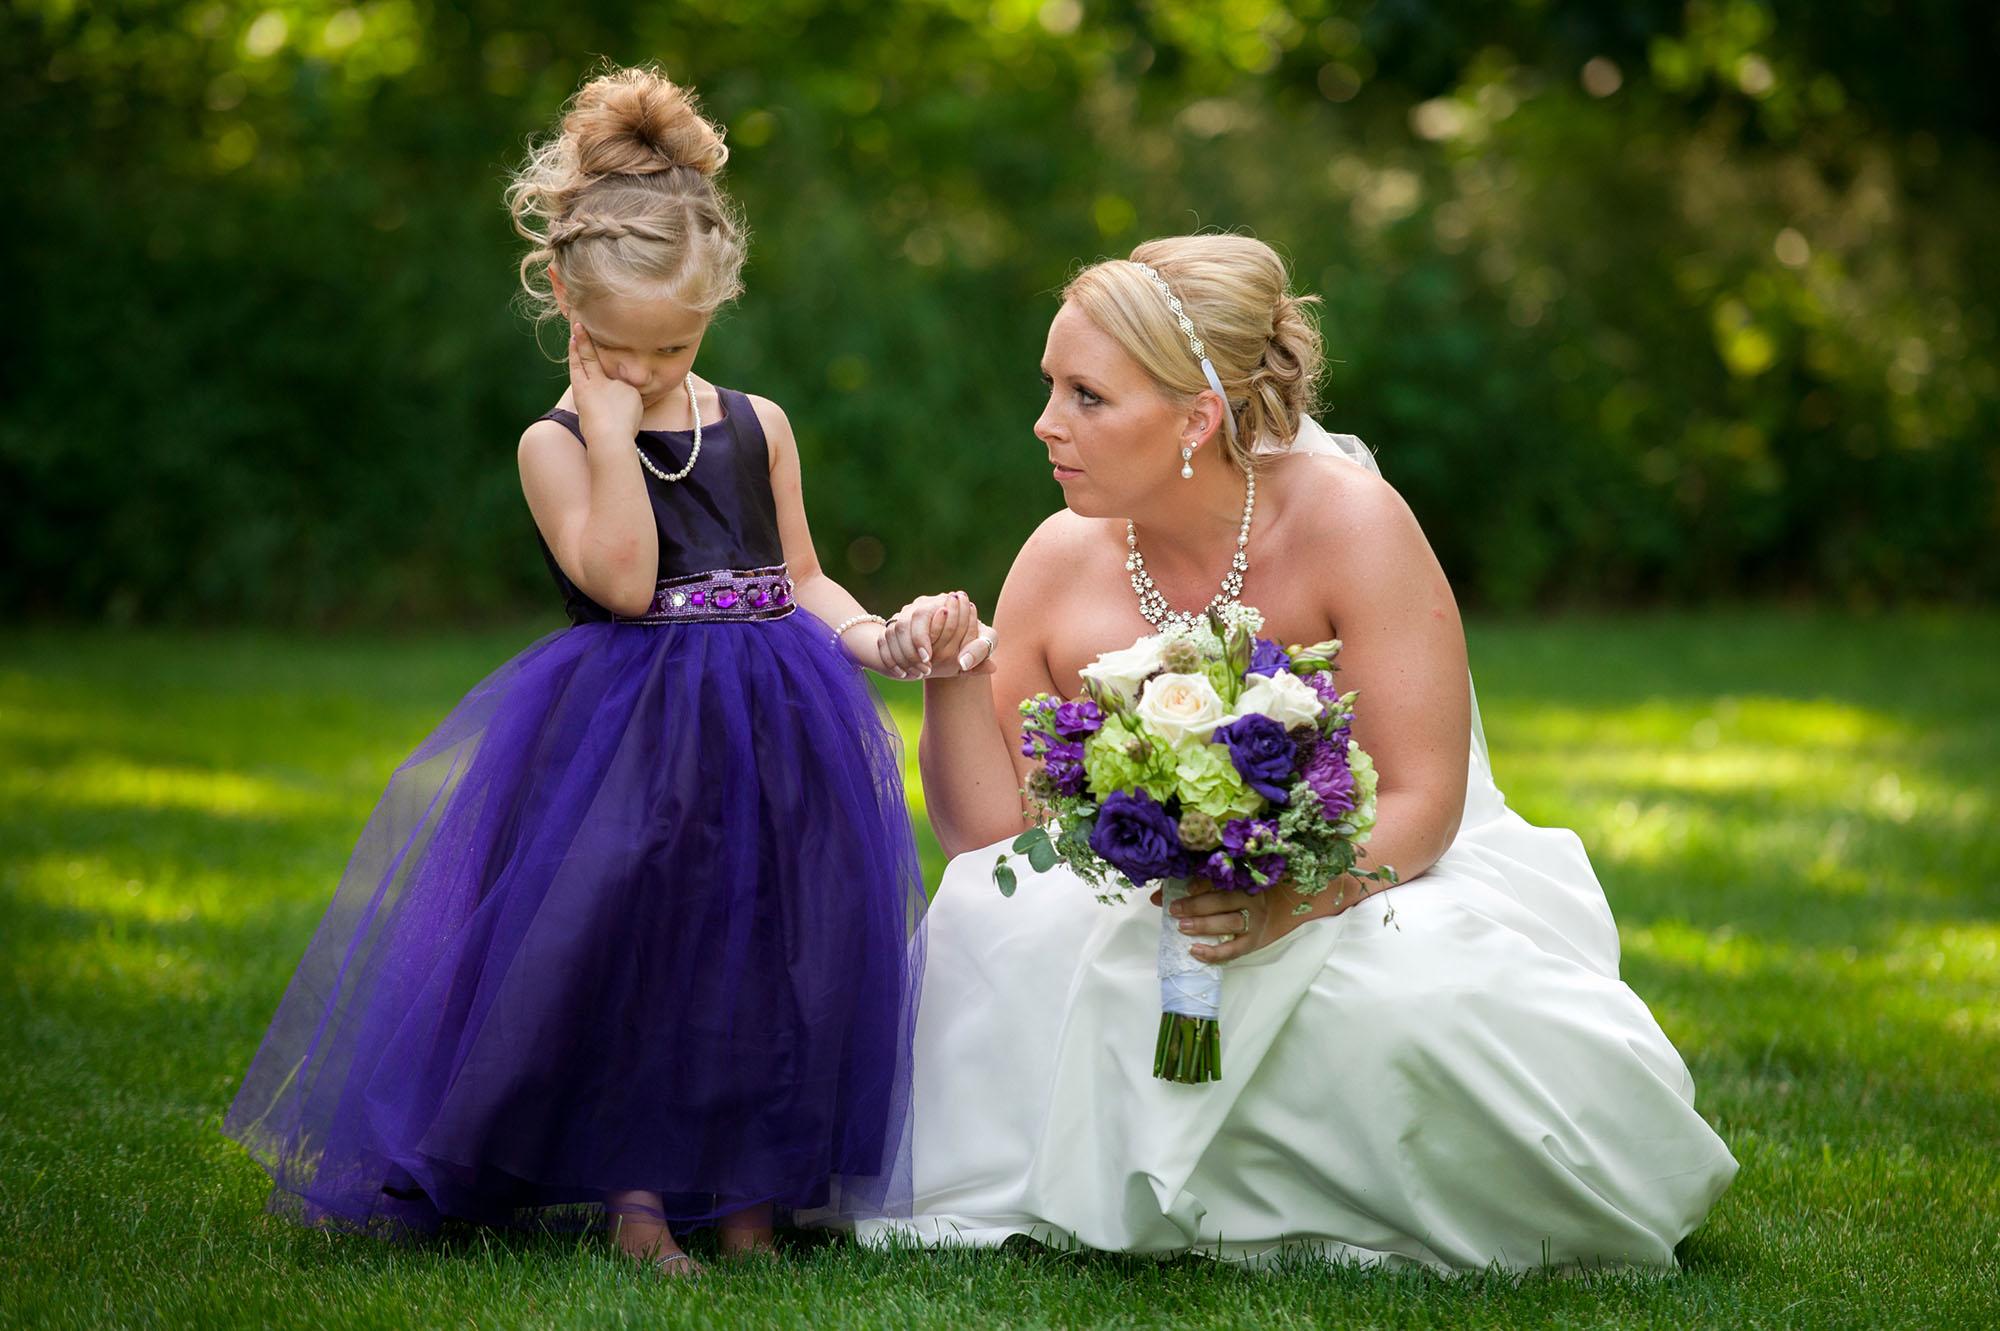 minneapolis-wedding-photography-mark-kegans-319.jpg